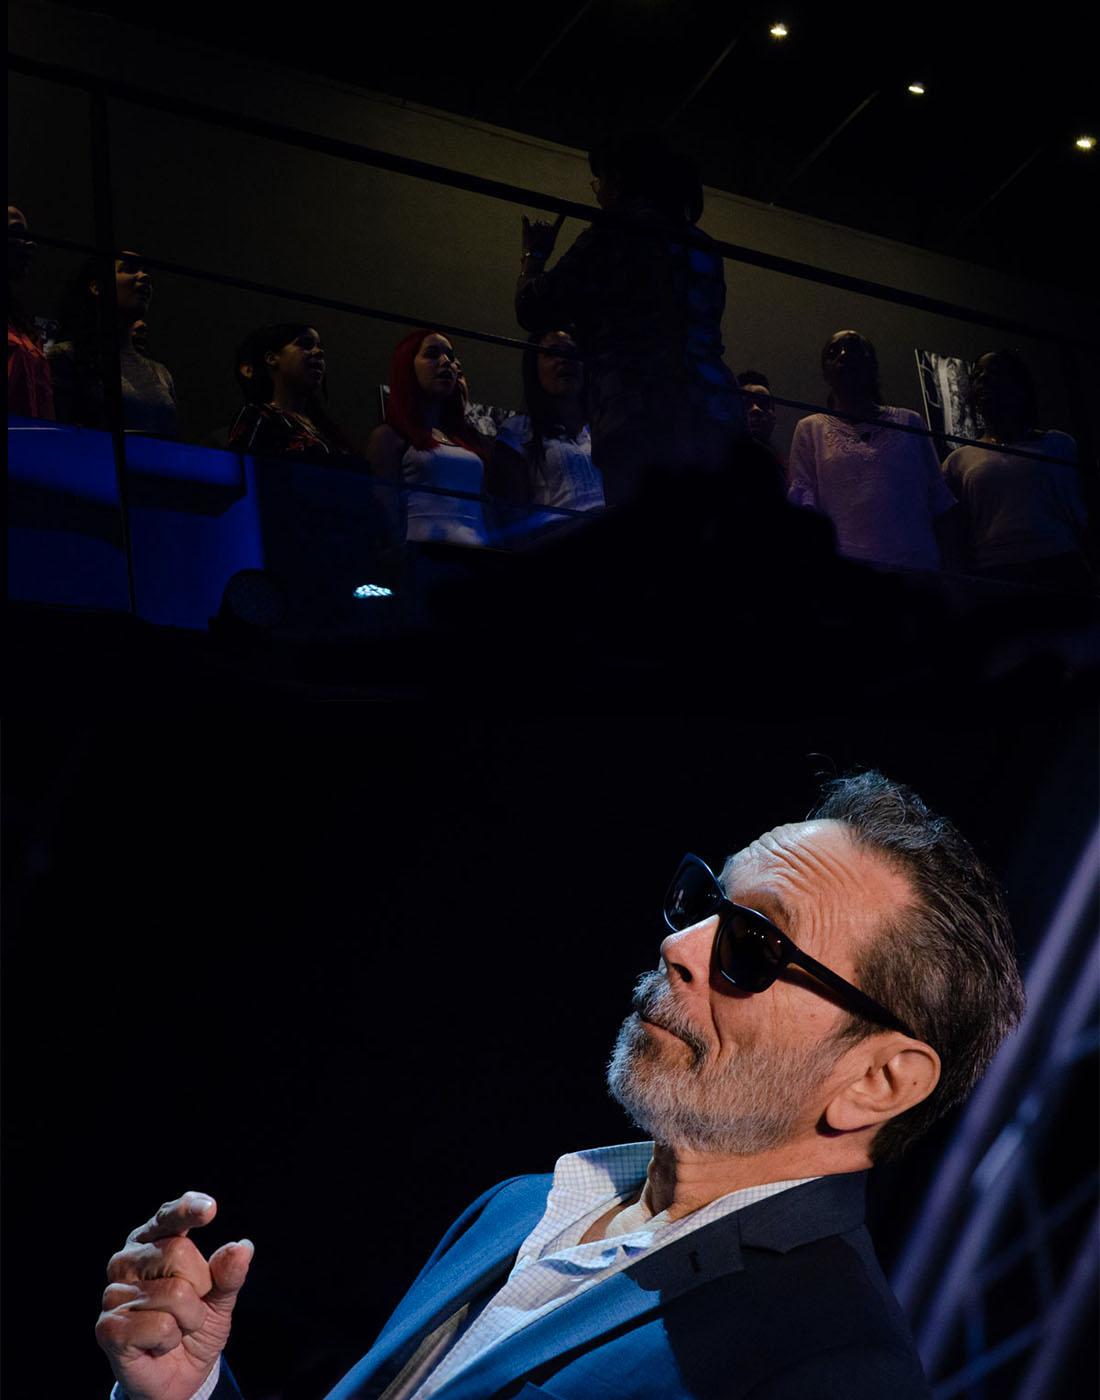 Leo Brouwer Tribute at Fábrica de Arte Cubano. Photo credit: Danilo Navas, Raul Da Gama